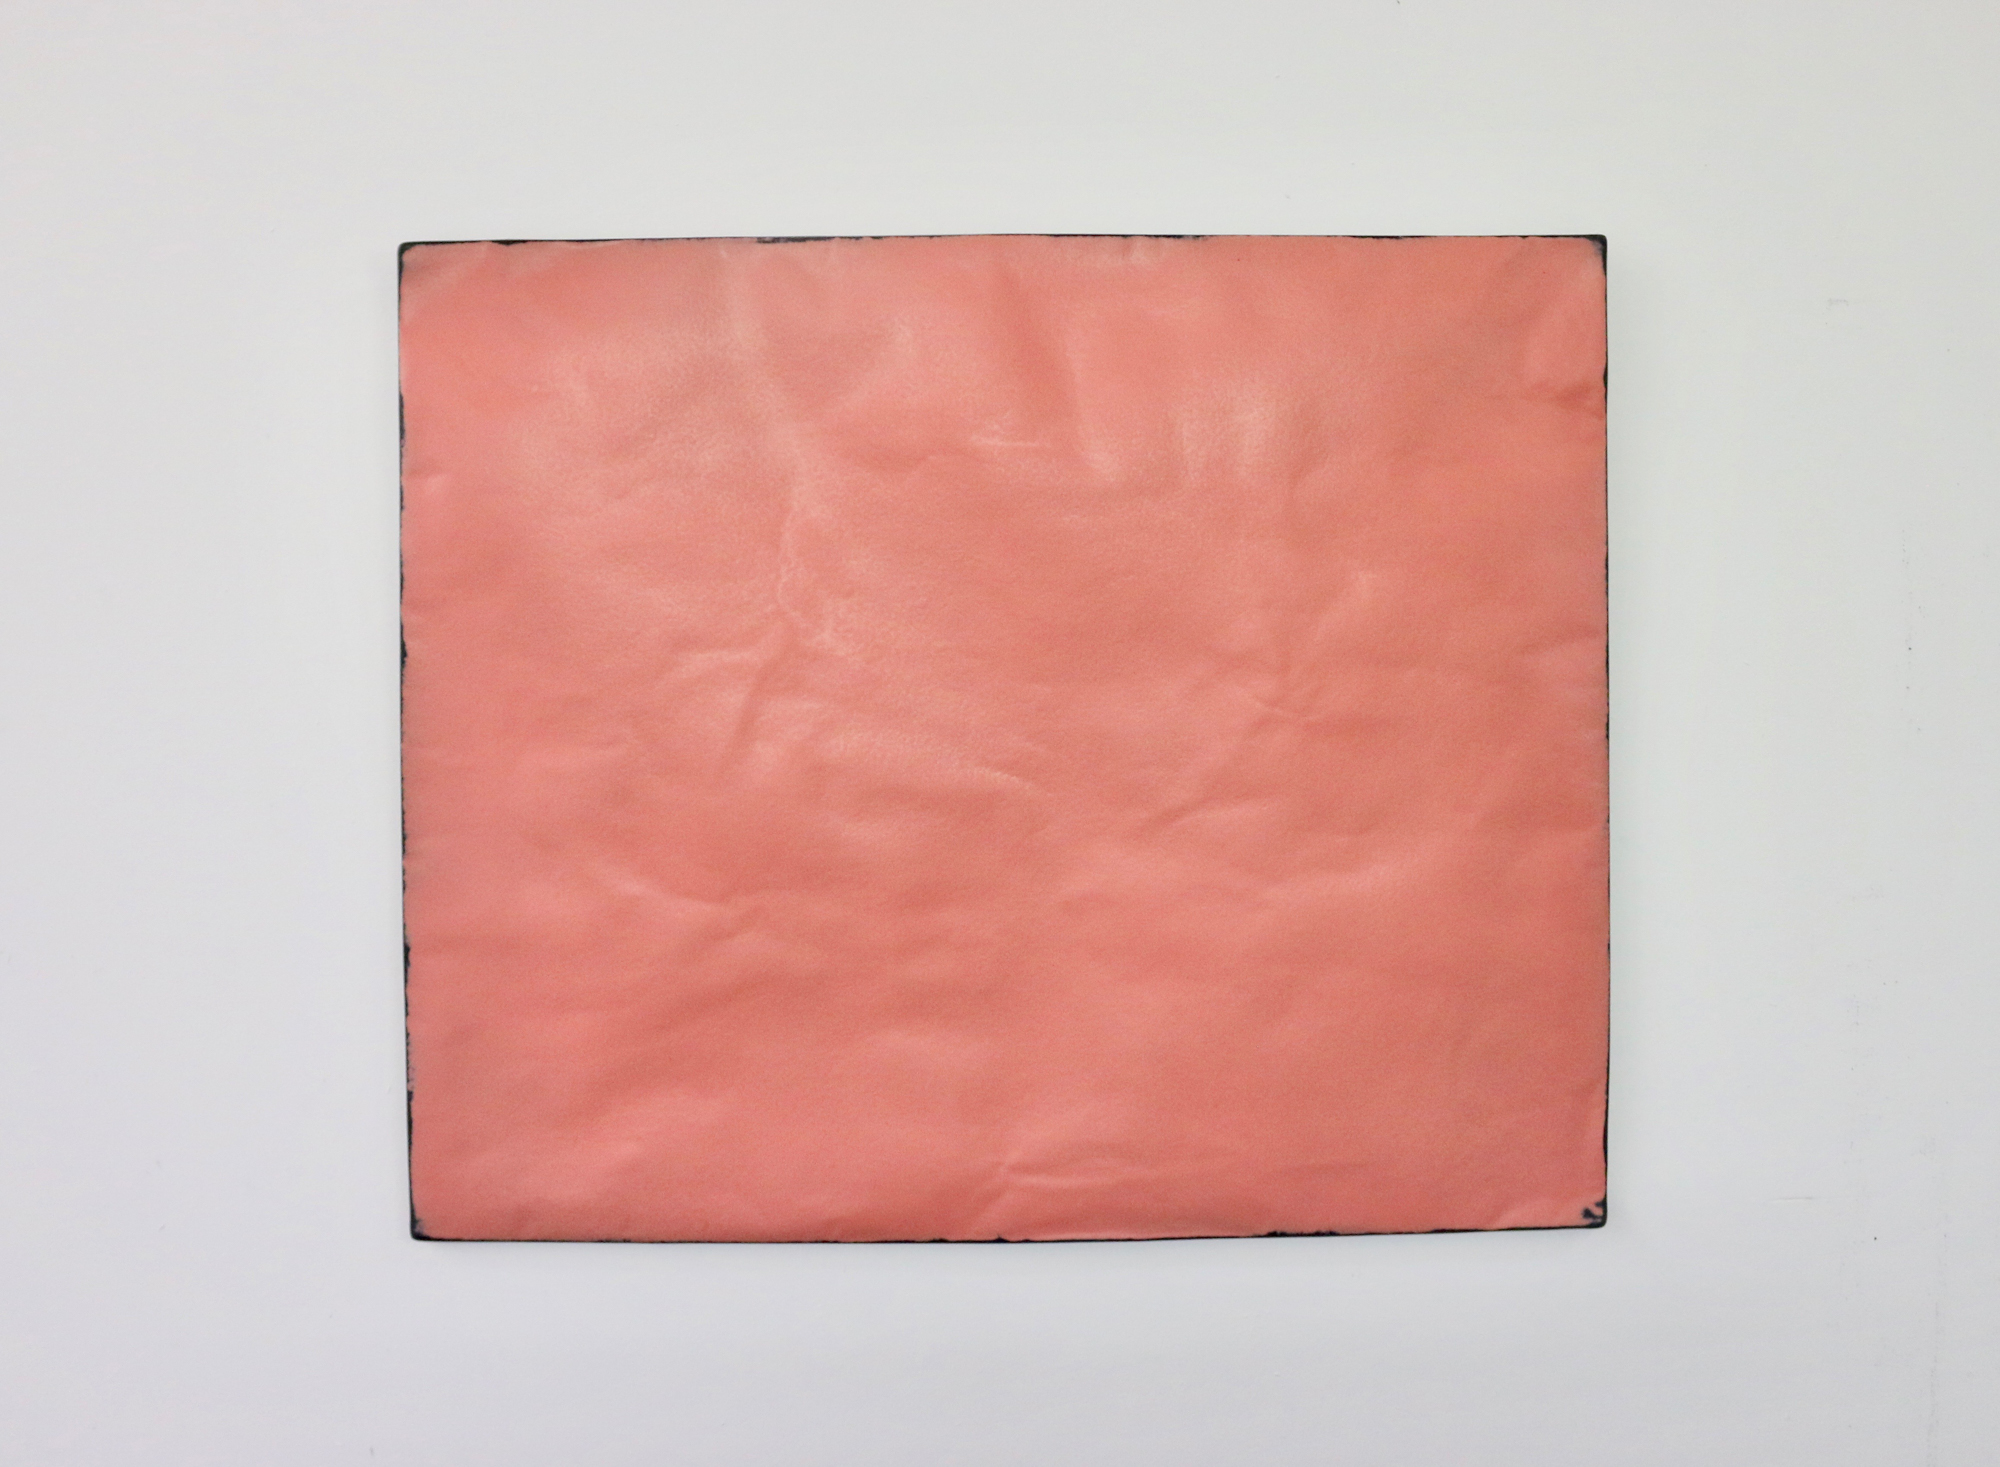 Johan De Wit, Untitled, 2018, Paper, Resin, Marble, Acrylic, 58 x 48 x 2 cm, Affinity Art